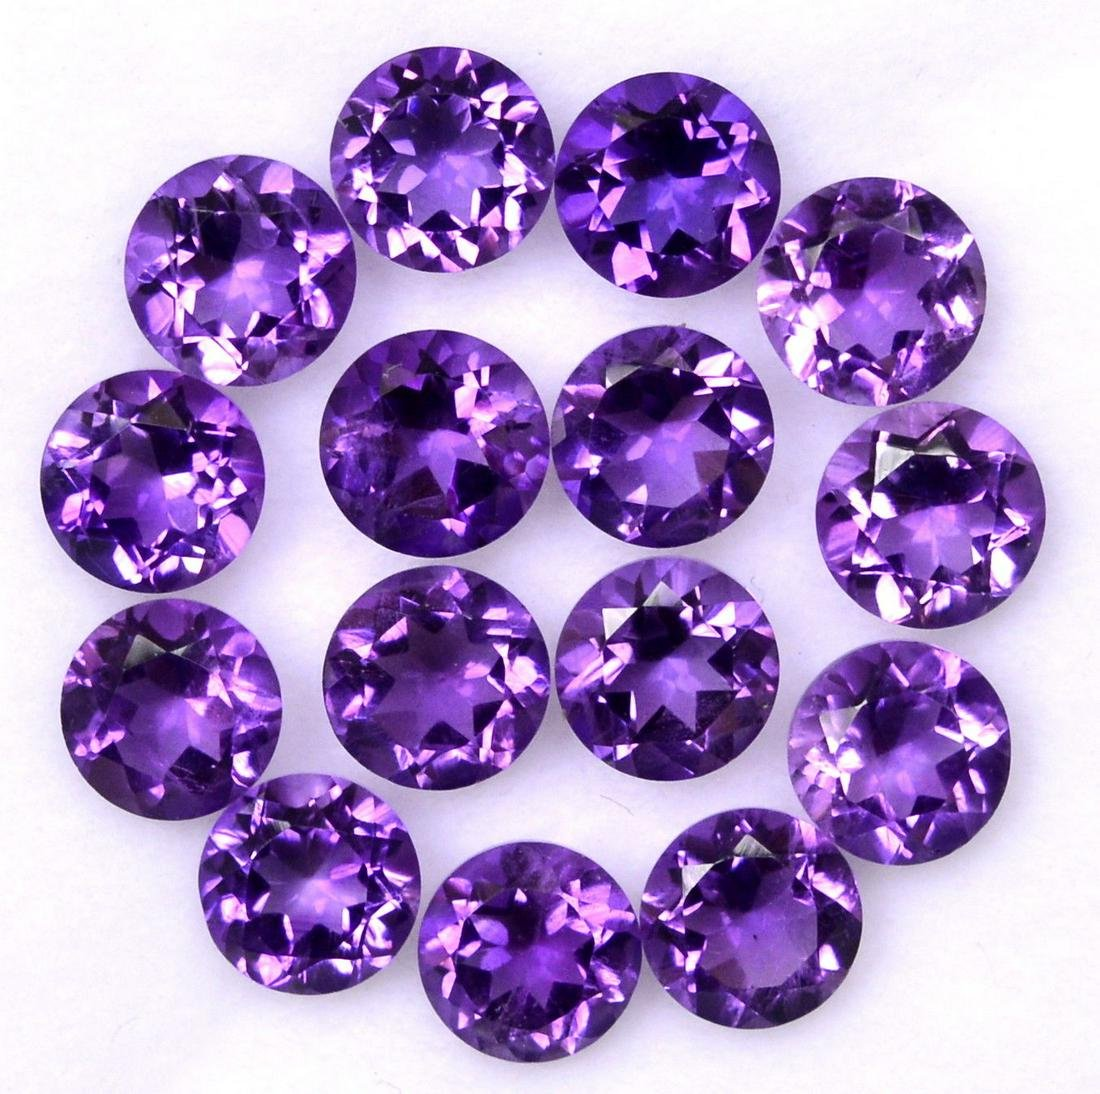 Natural Purple Amethyst 9 MM Round Cut Loose Gemstone